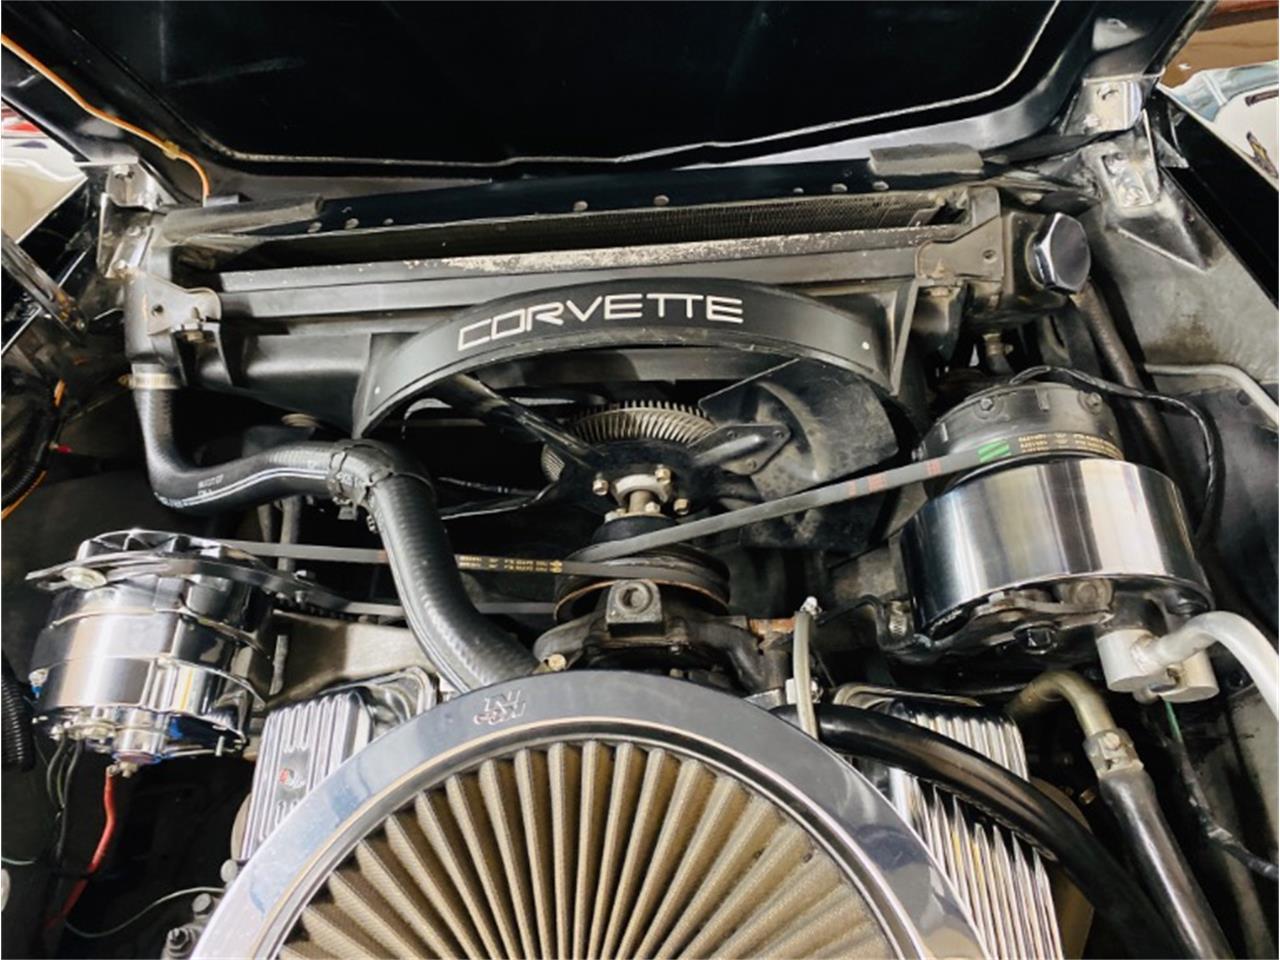 1980 Chevrolet Corvette (CC-1344894) for sale in Mundelein, Illinois